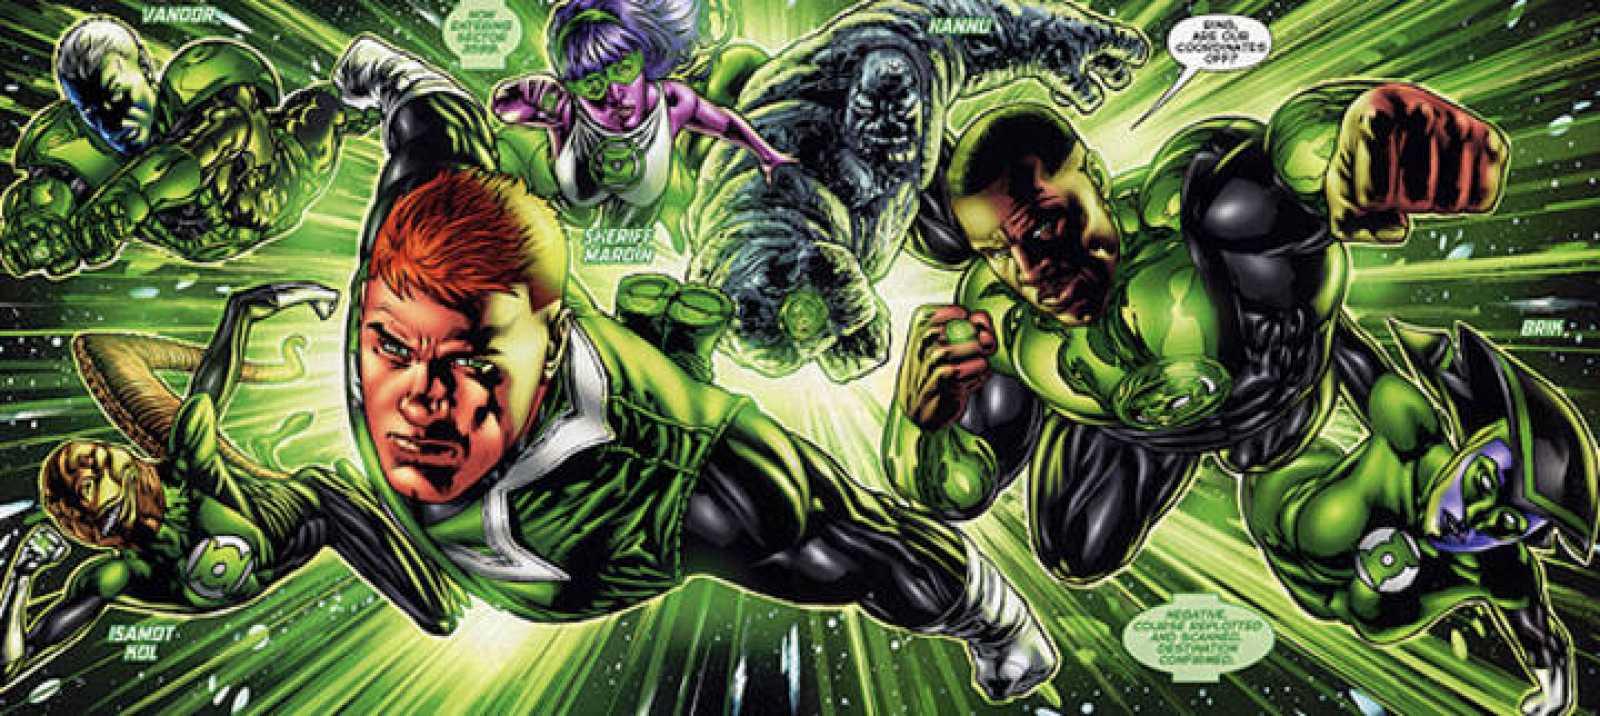 James Steward y Hal Jordan Green Lantern Corps